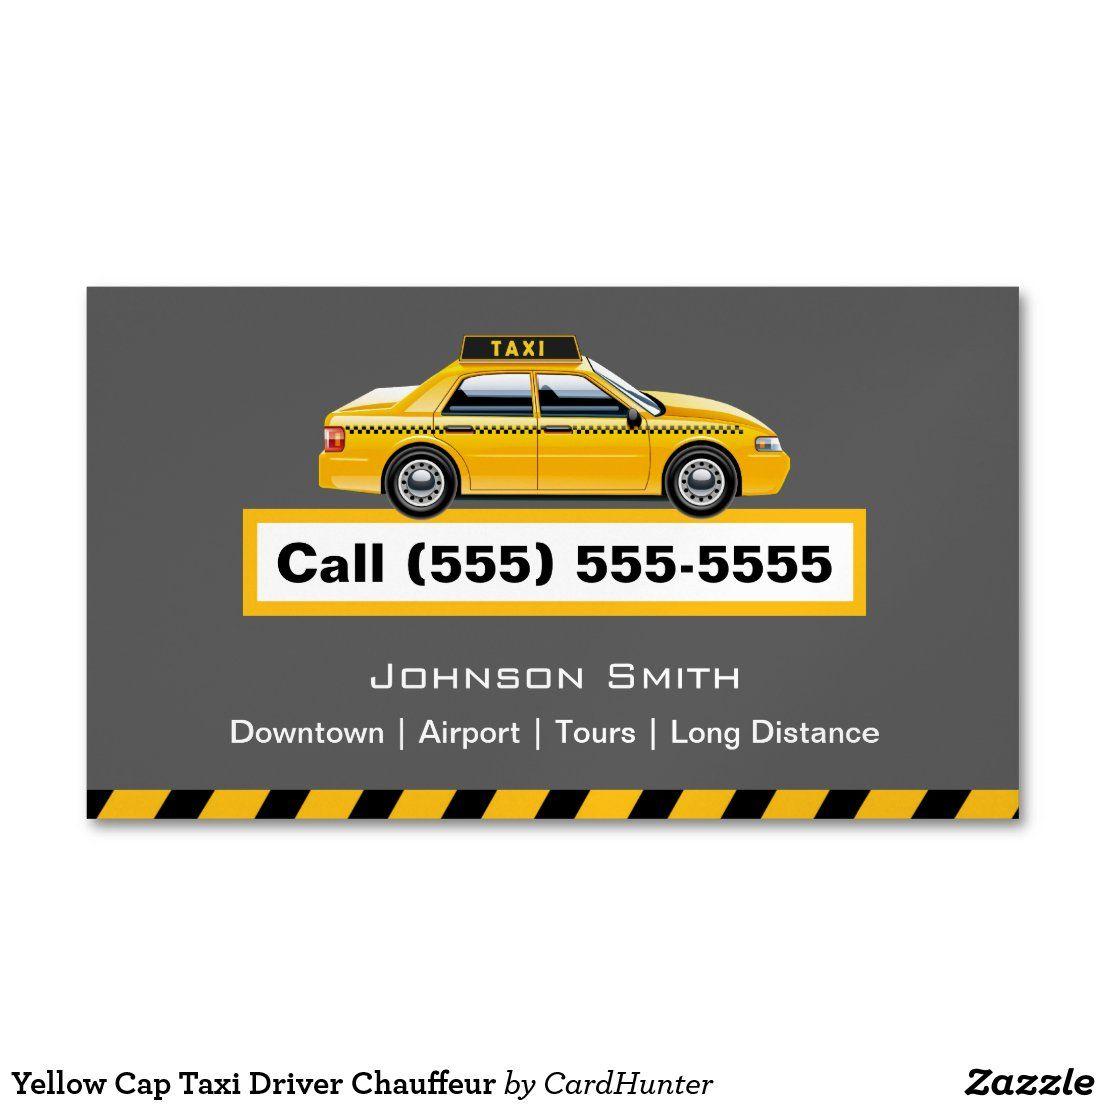 Yellow Cap Taxi Driver Chauffeur Magnetic Business Card Zazzle Com Magnetic Business Cards Taxi Driver Chauffeur